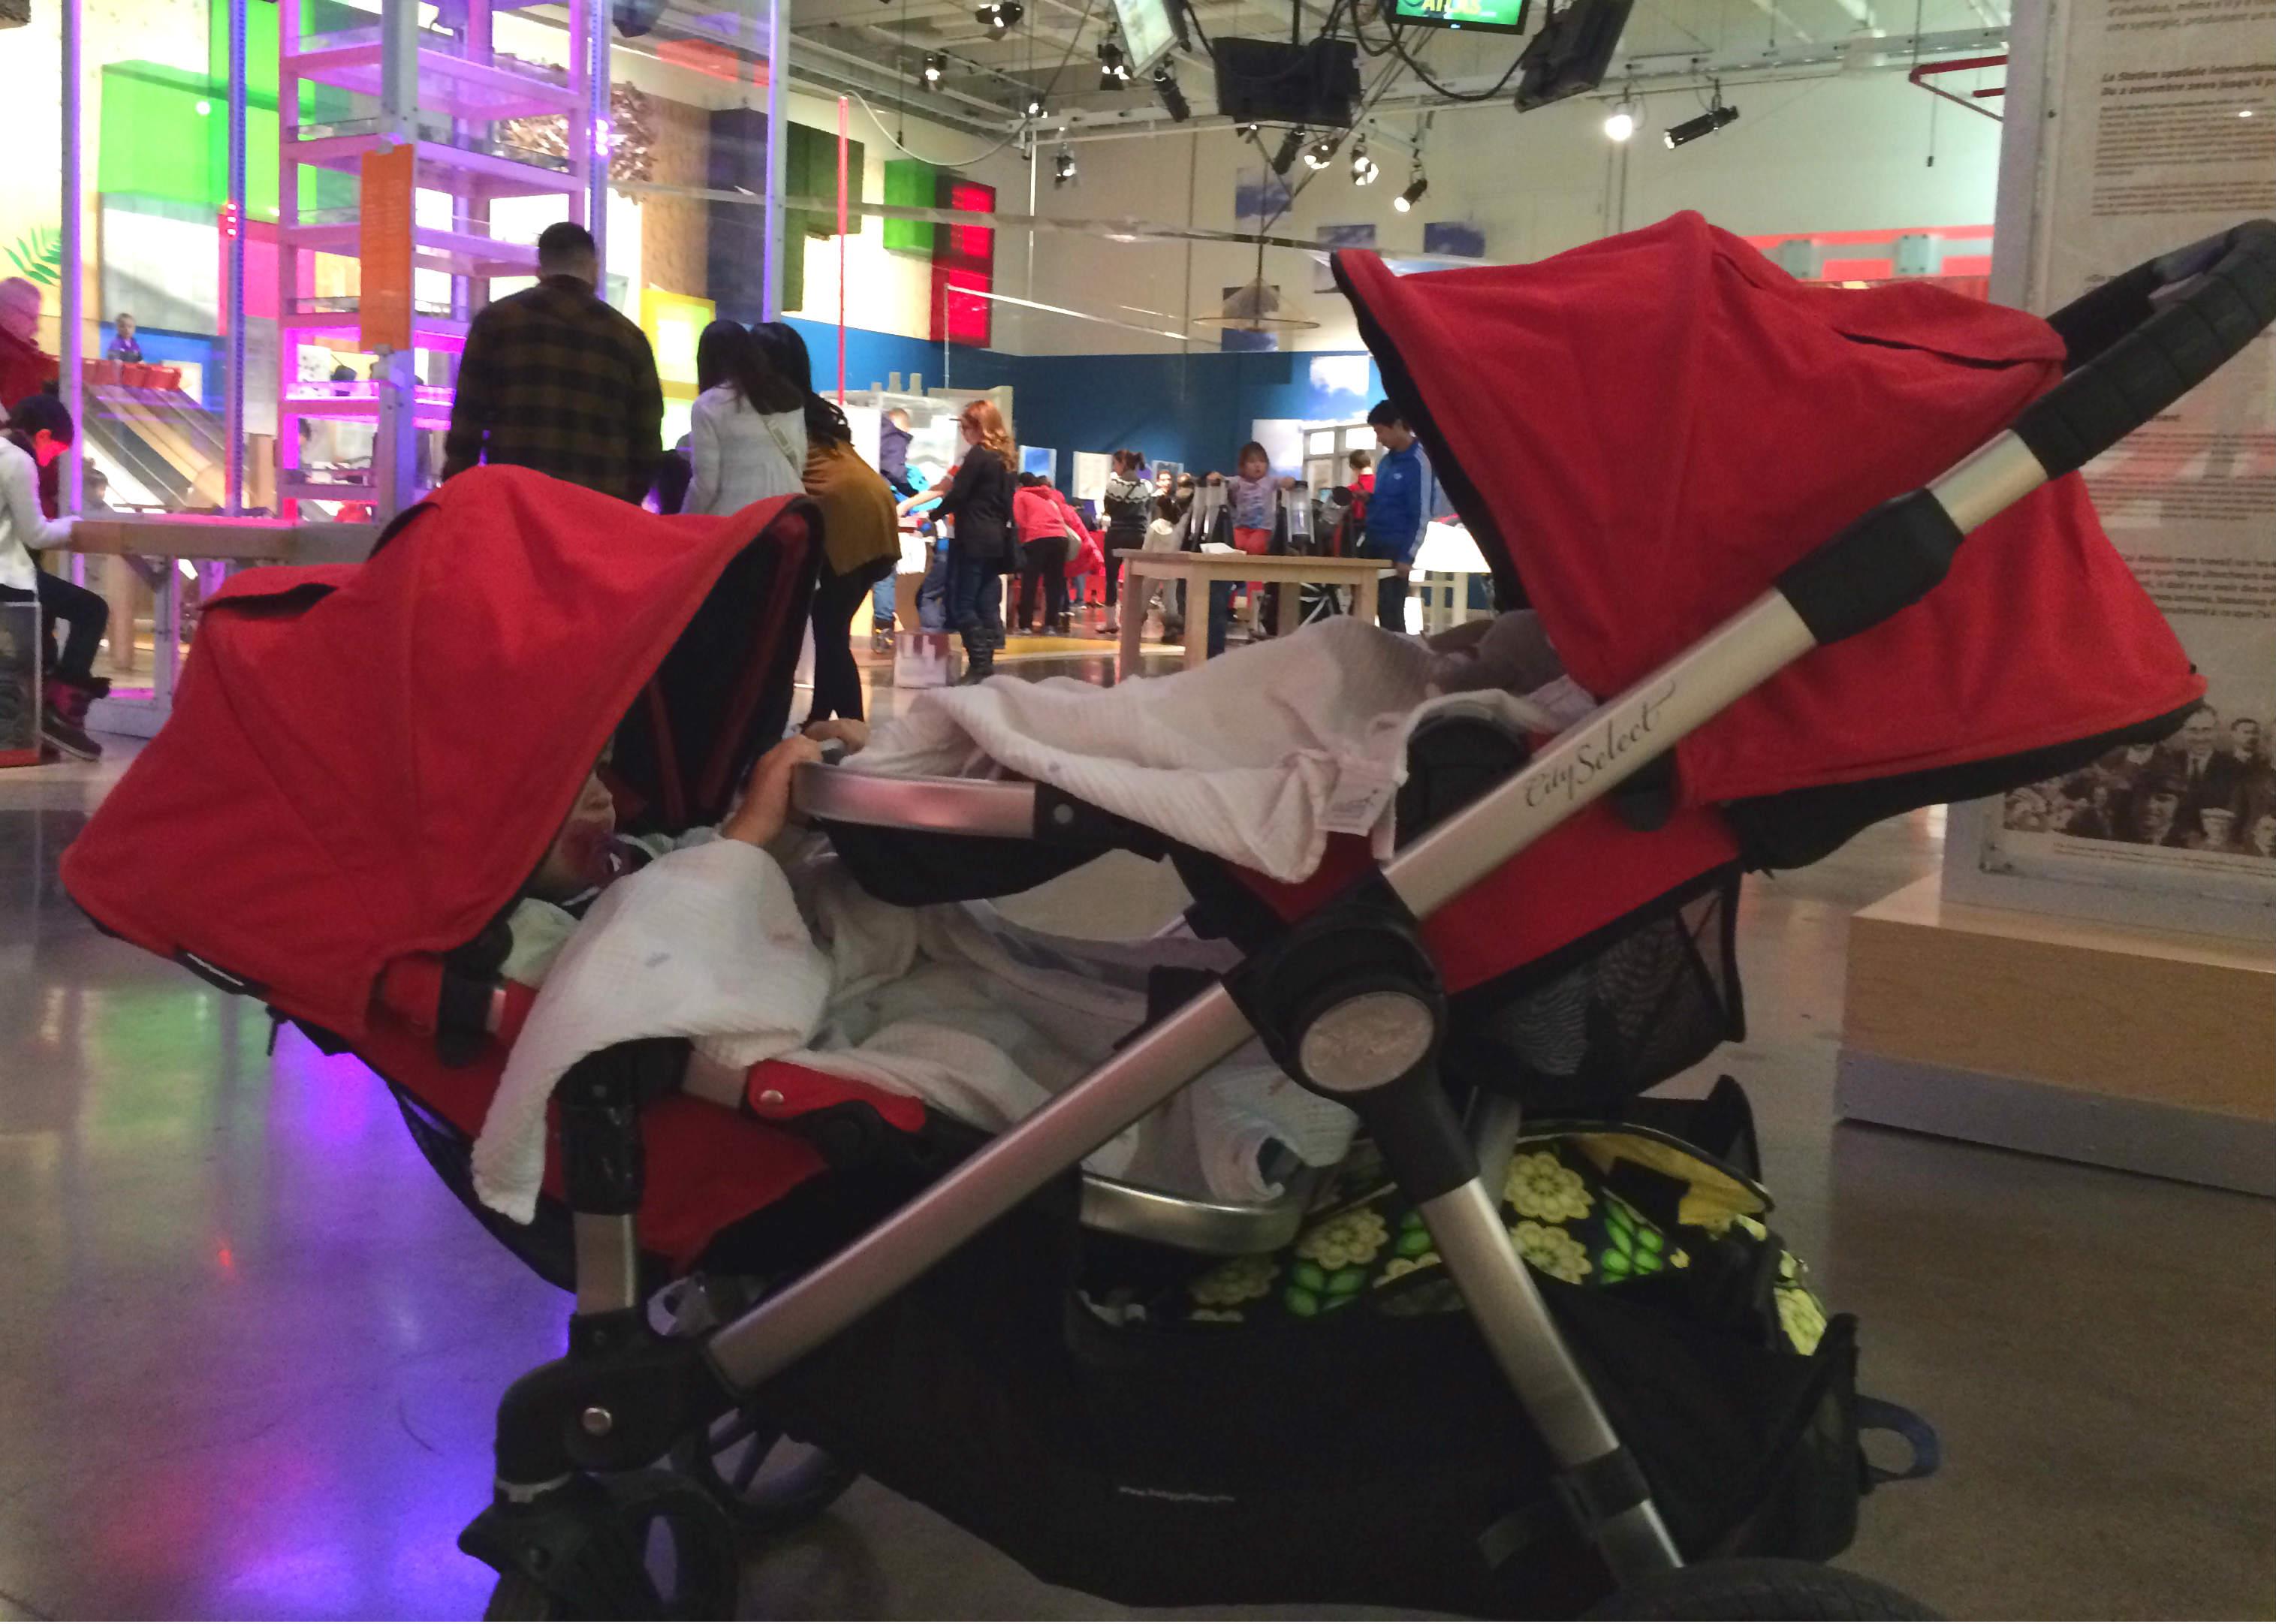 twins reclined in stroller